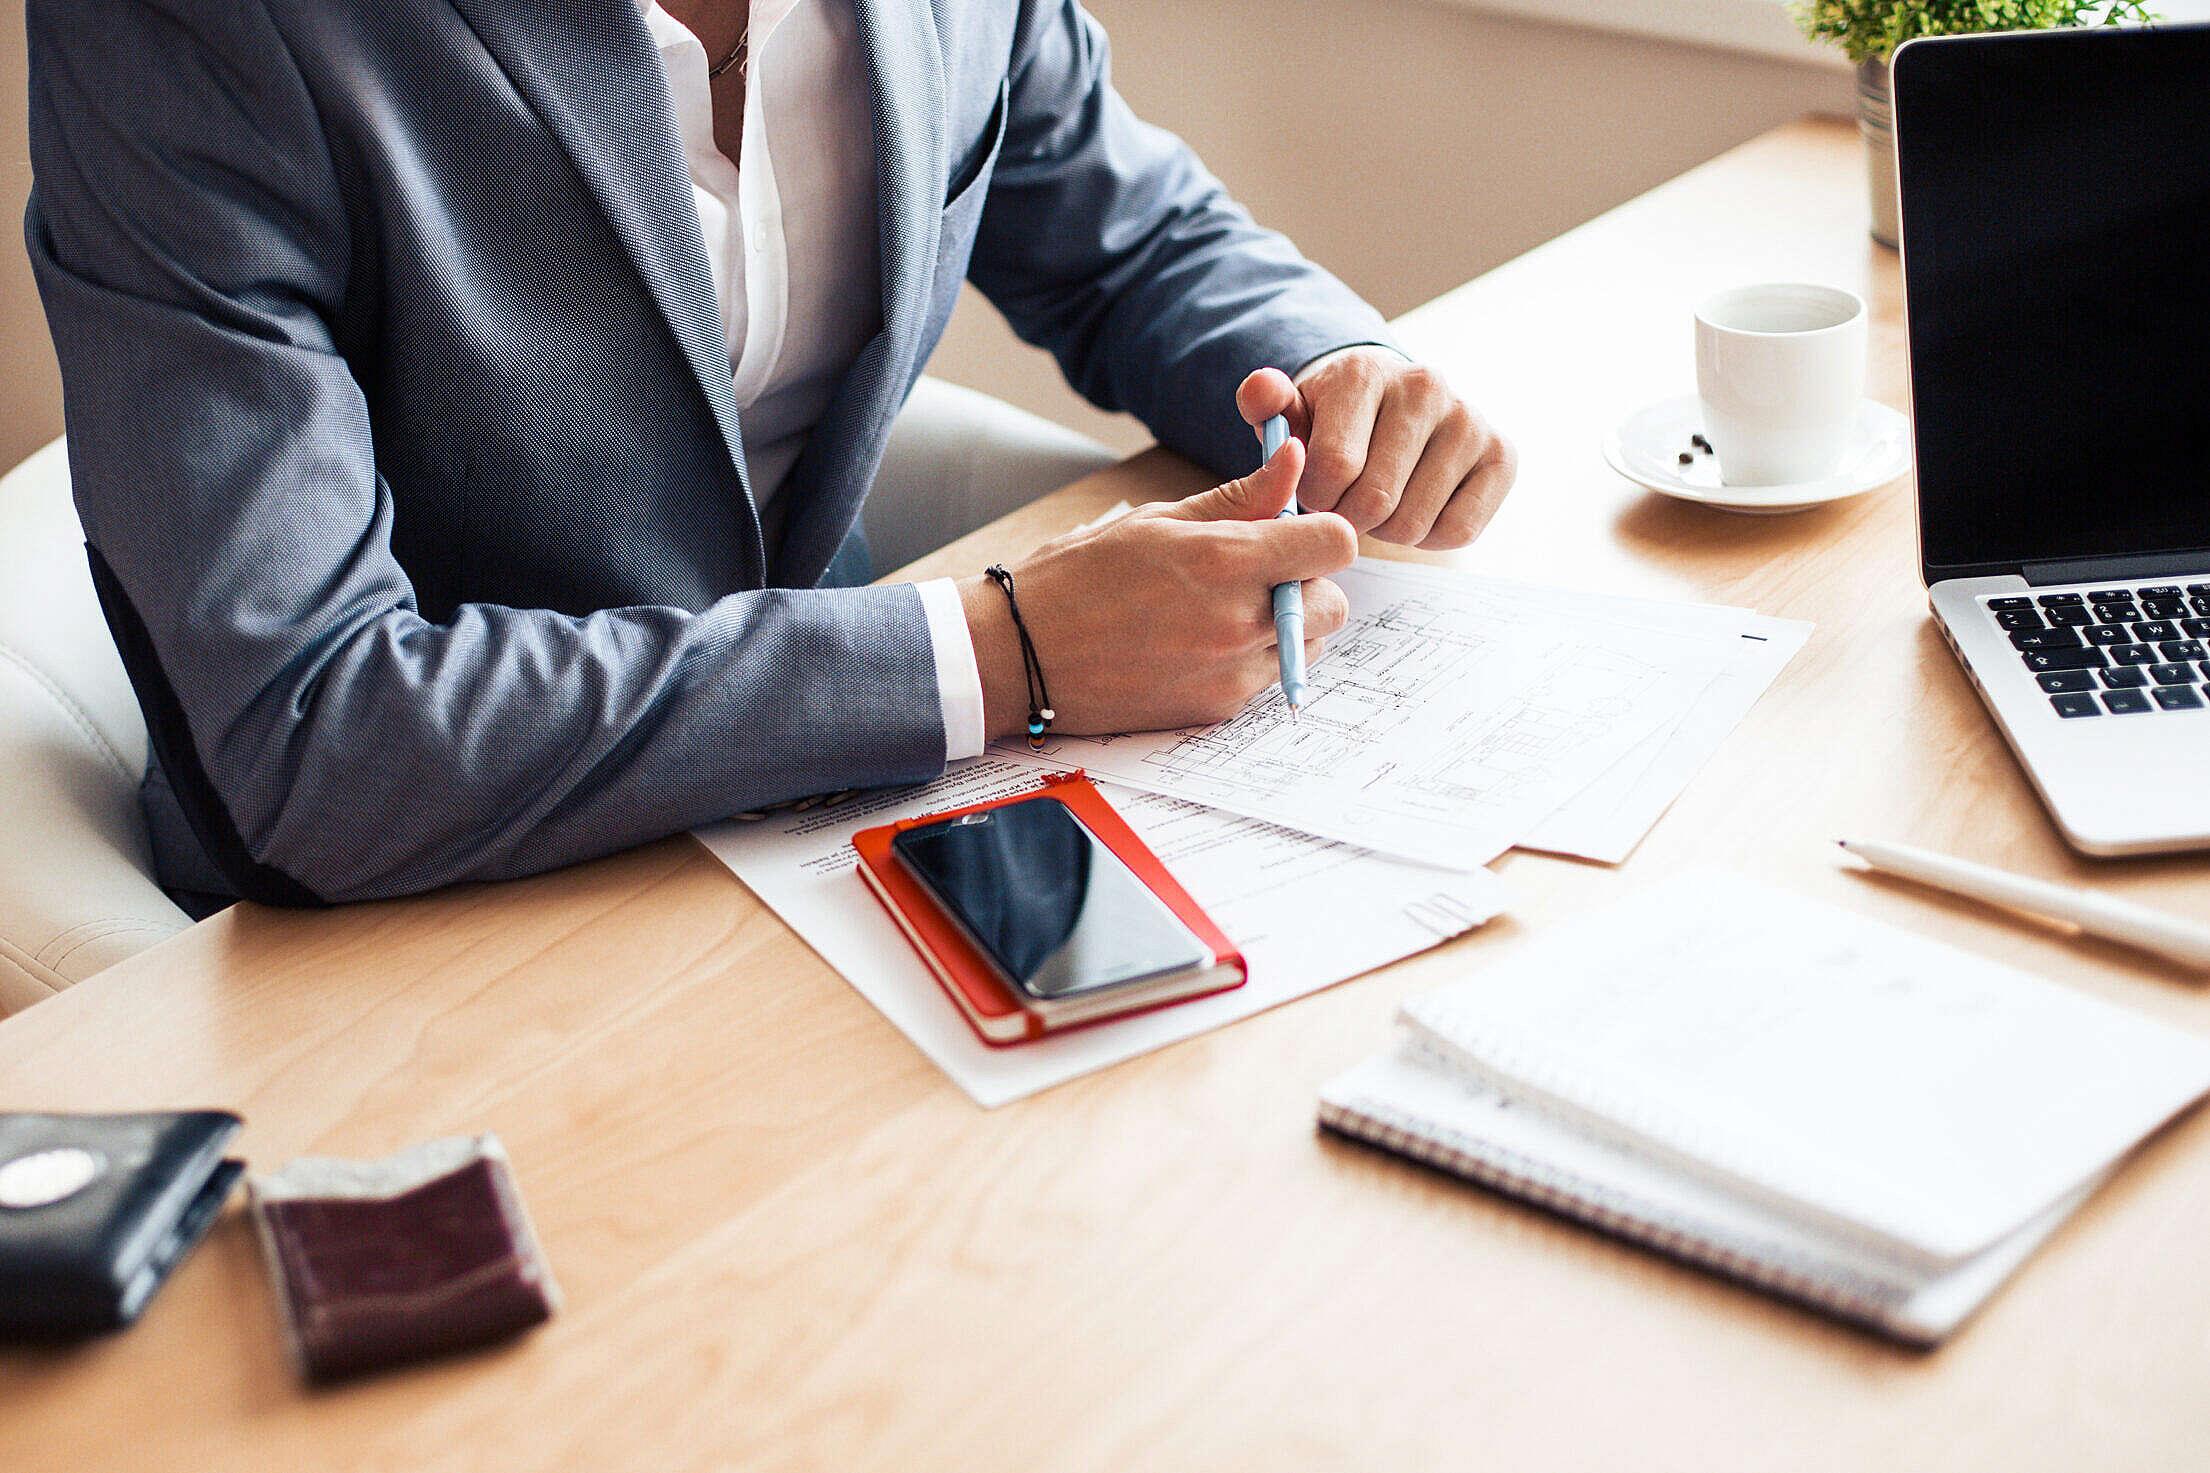 Man Wearing Blue Blazer on Business Meeting Free Stock Photo